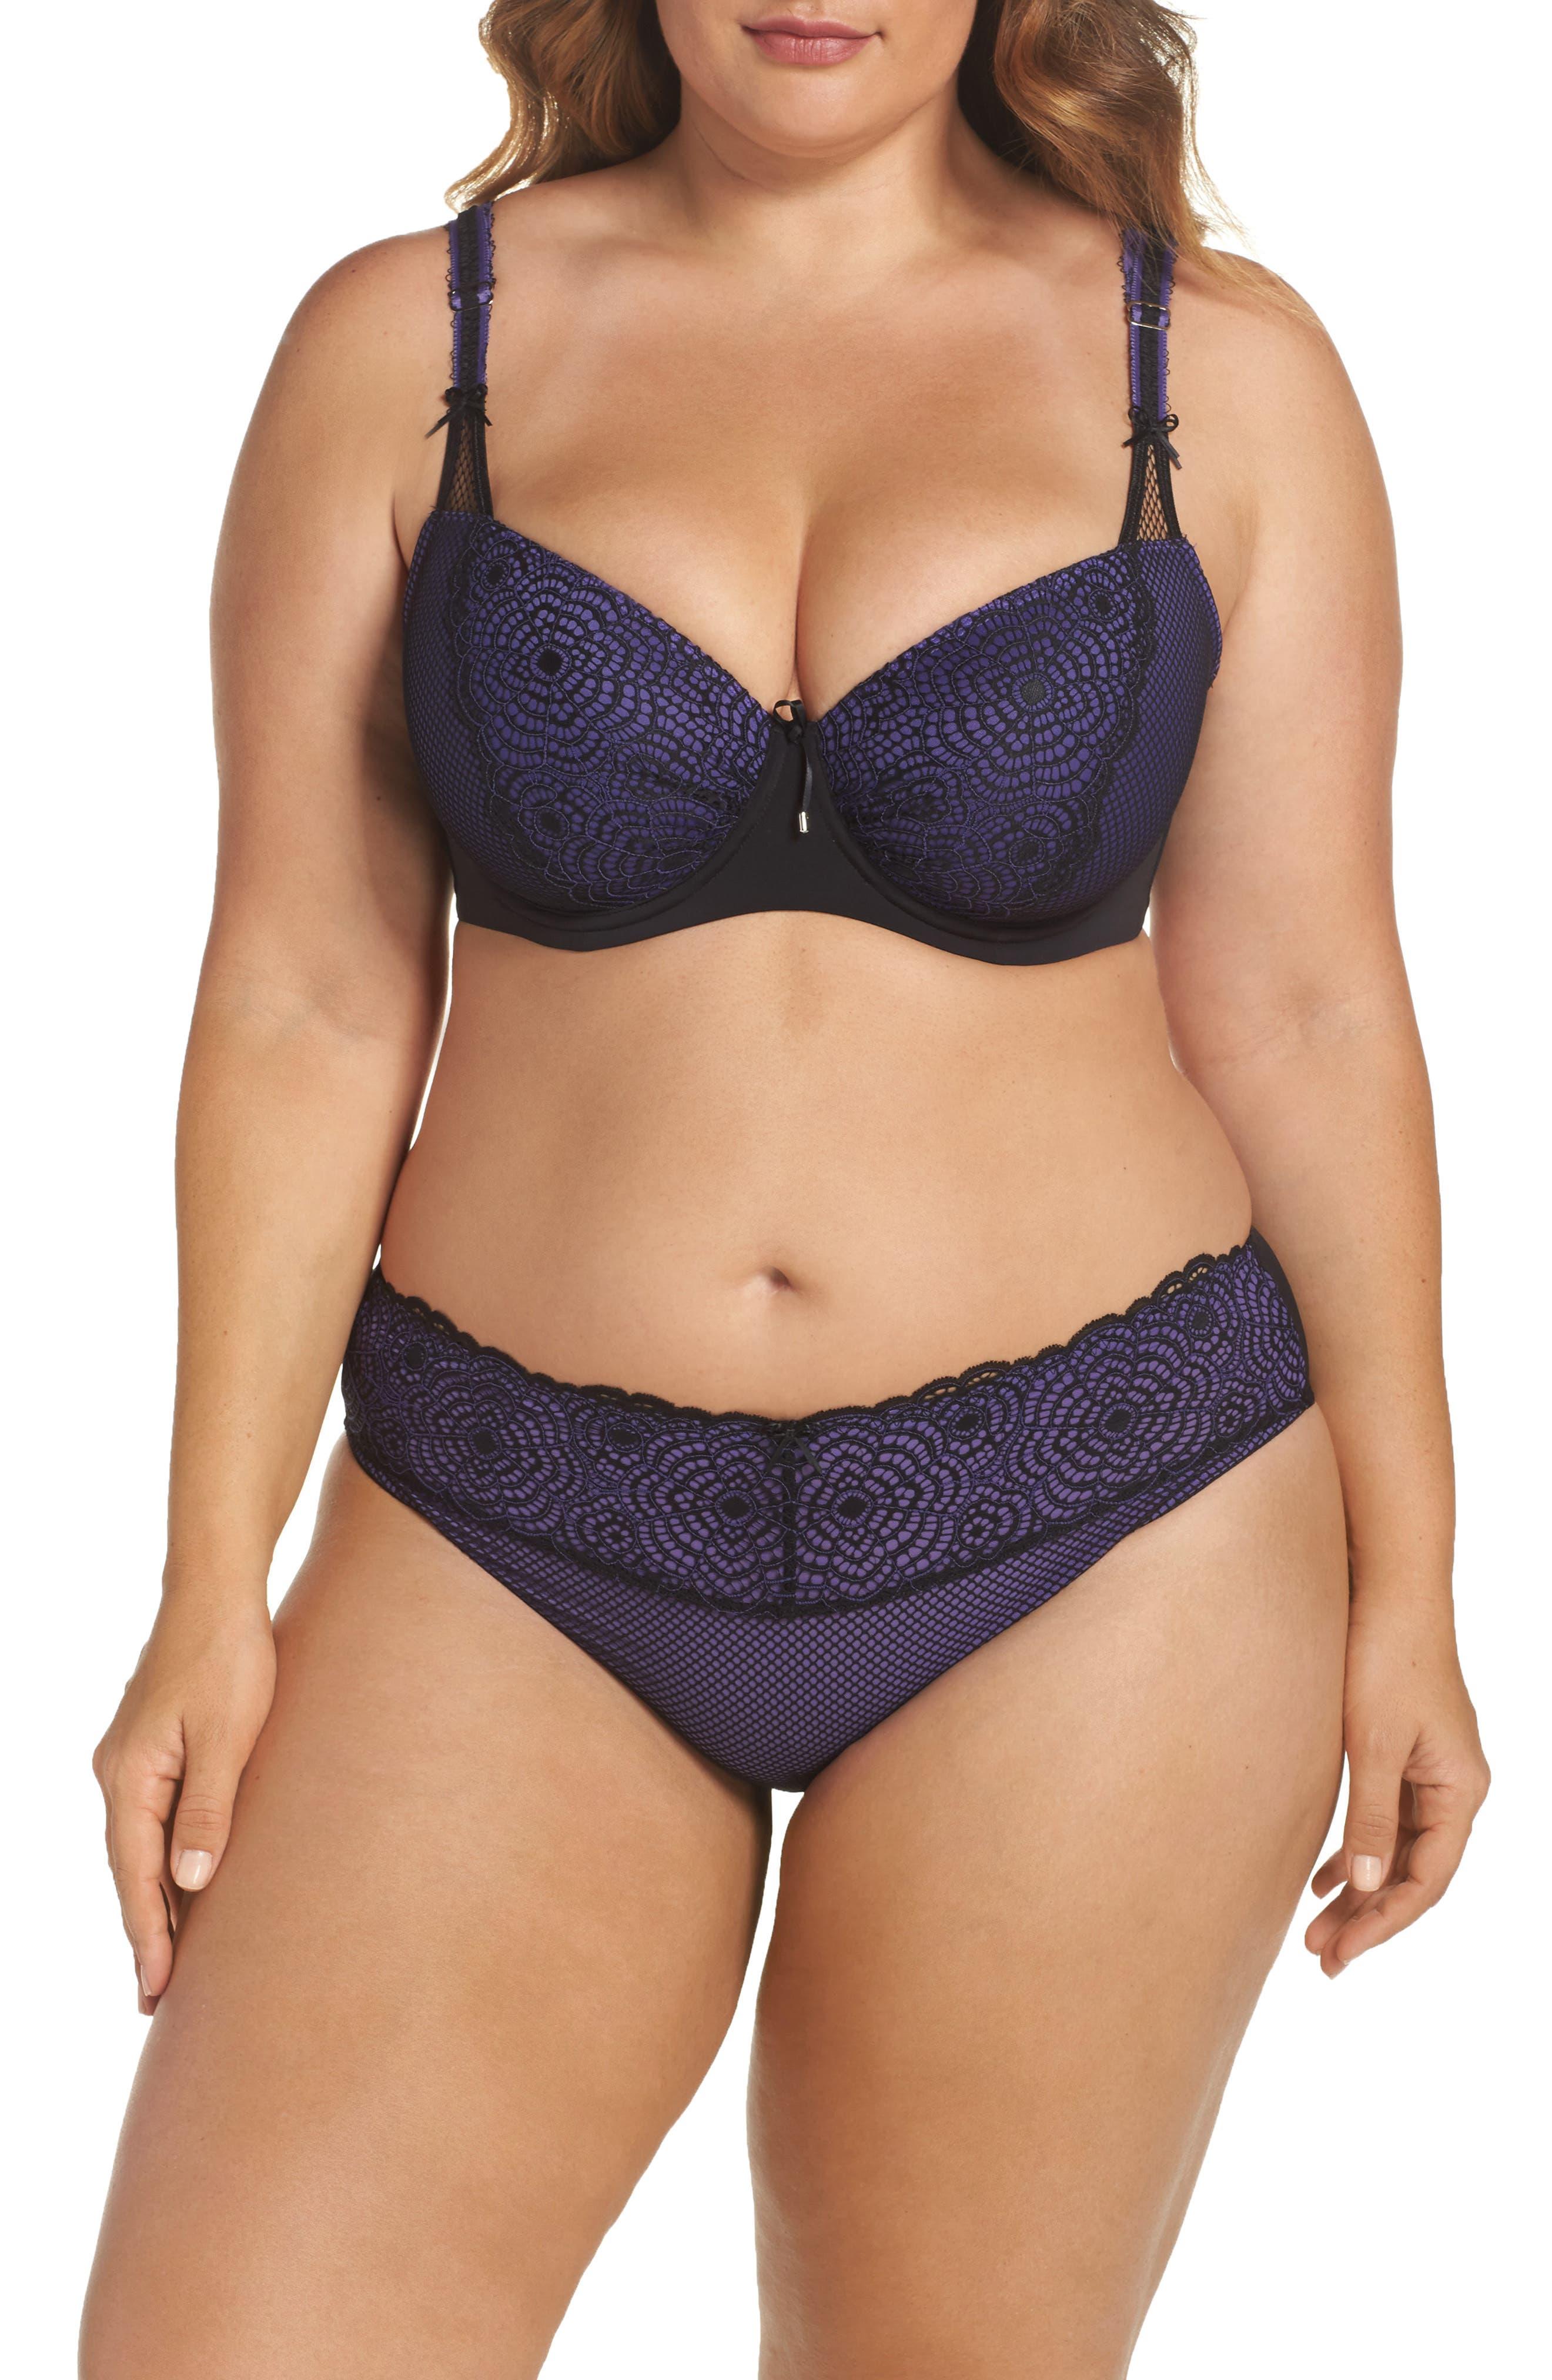 Ashley Graham Bra & Panties (Plus Size)